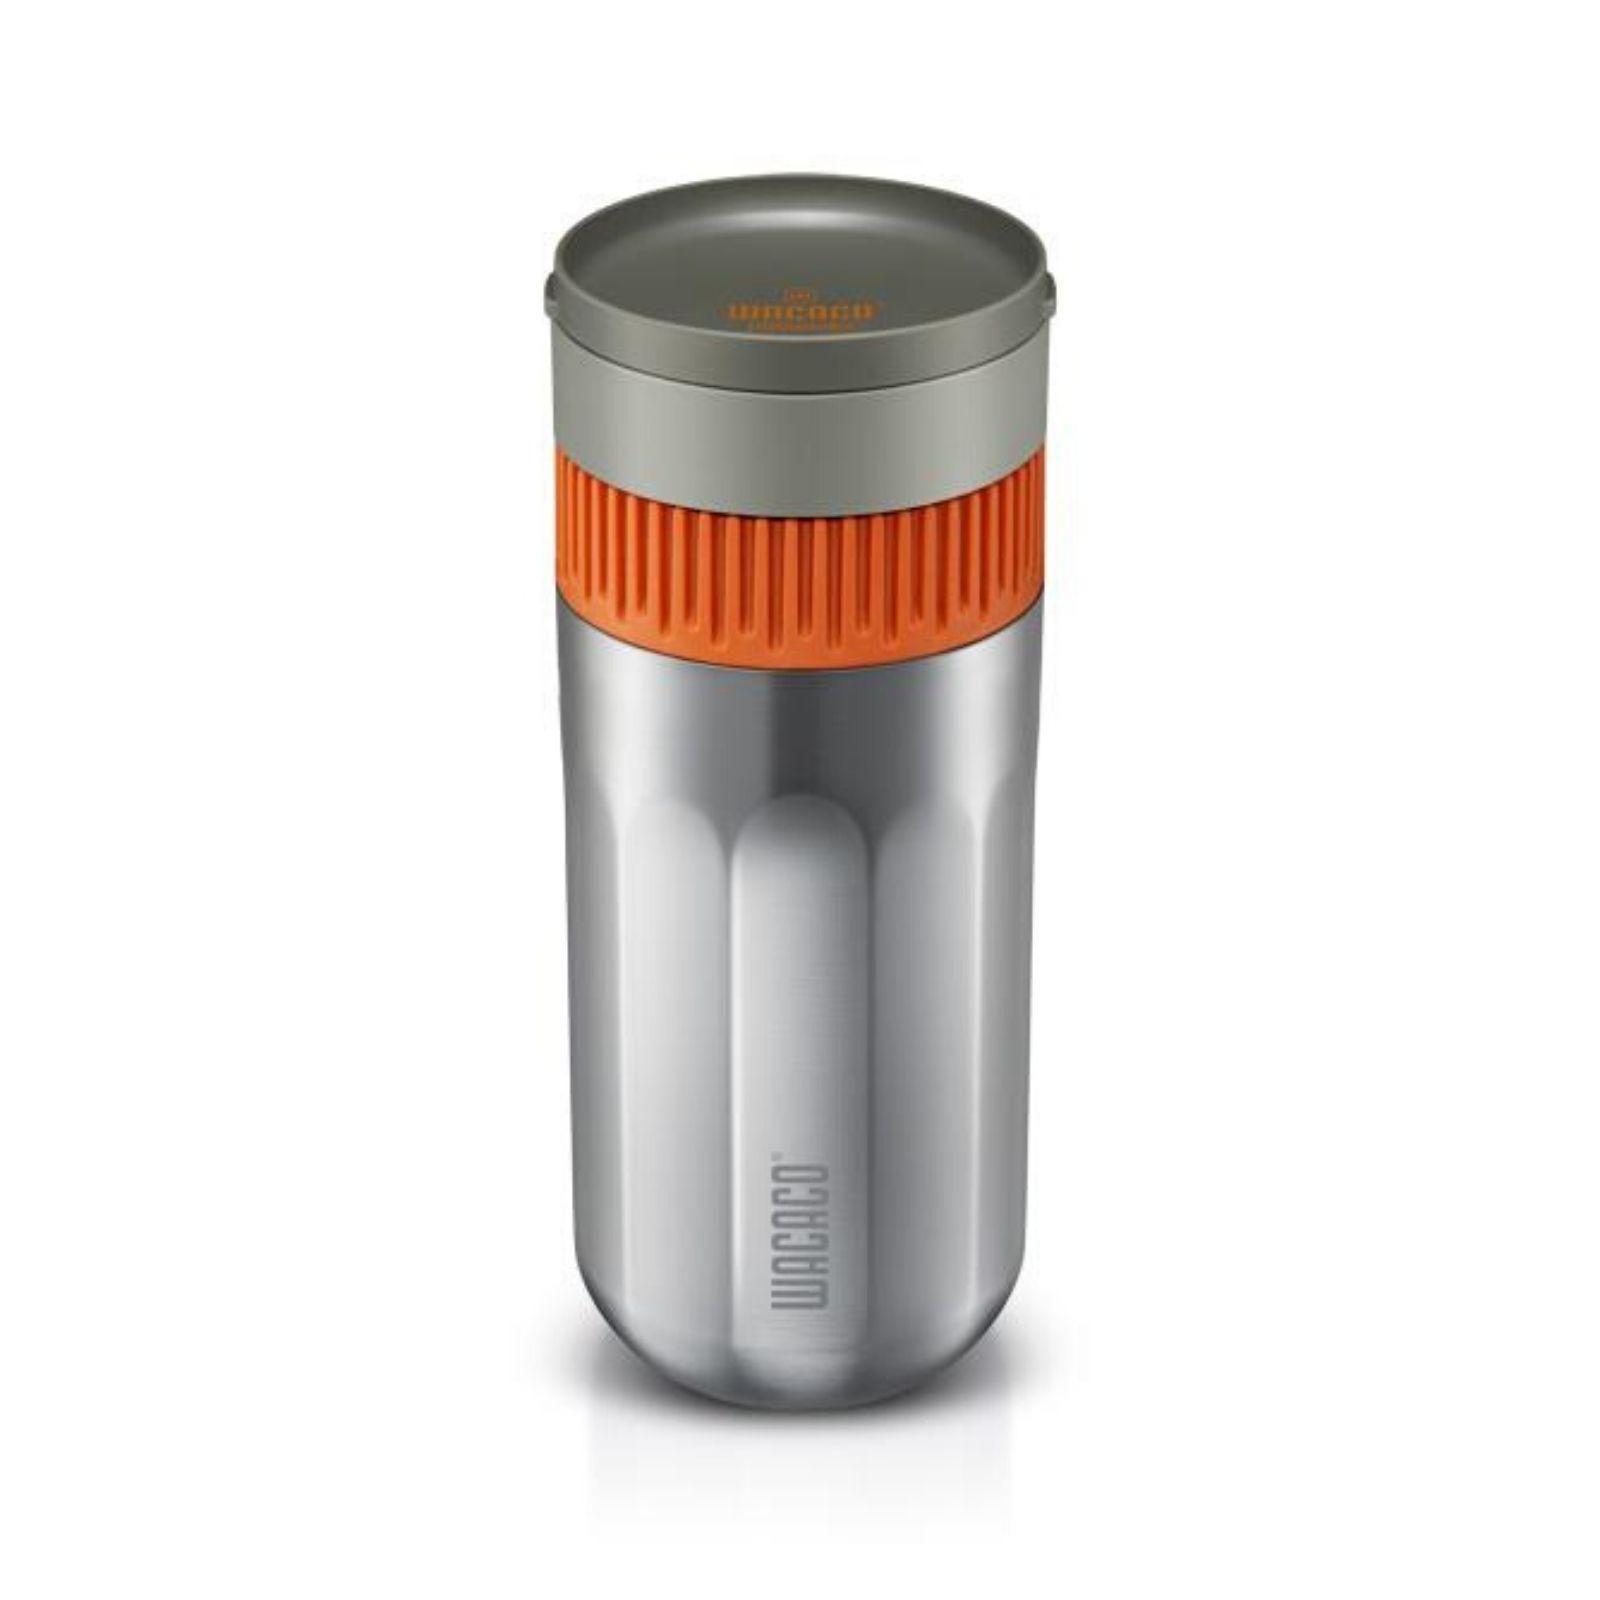 Wacaco Pipamoka Portable Filter Coffee Maker